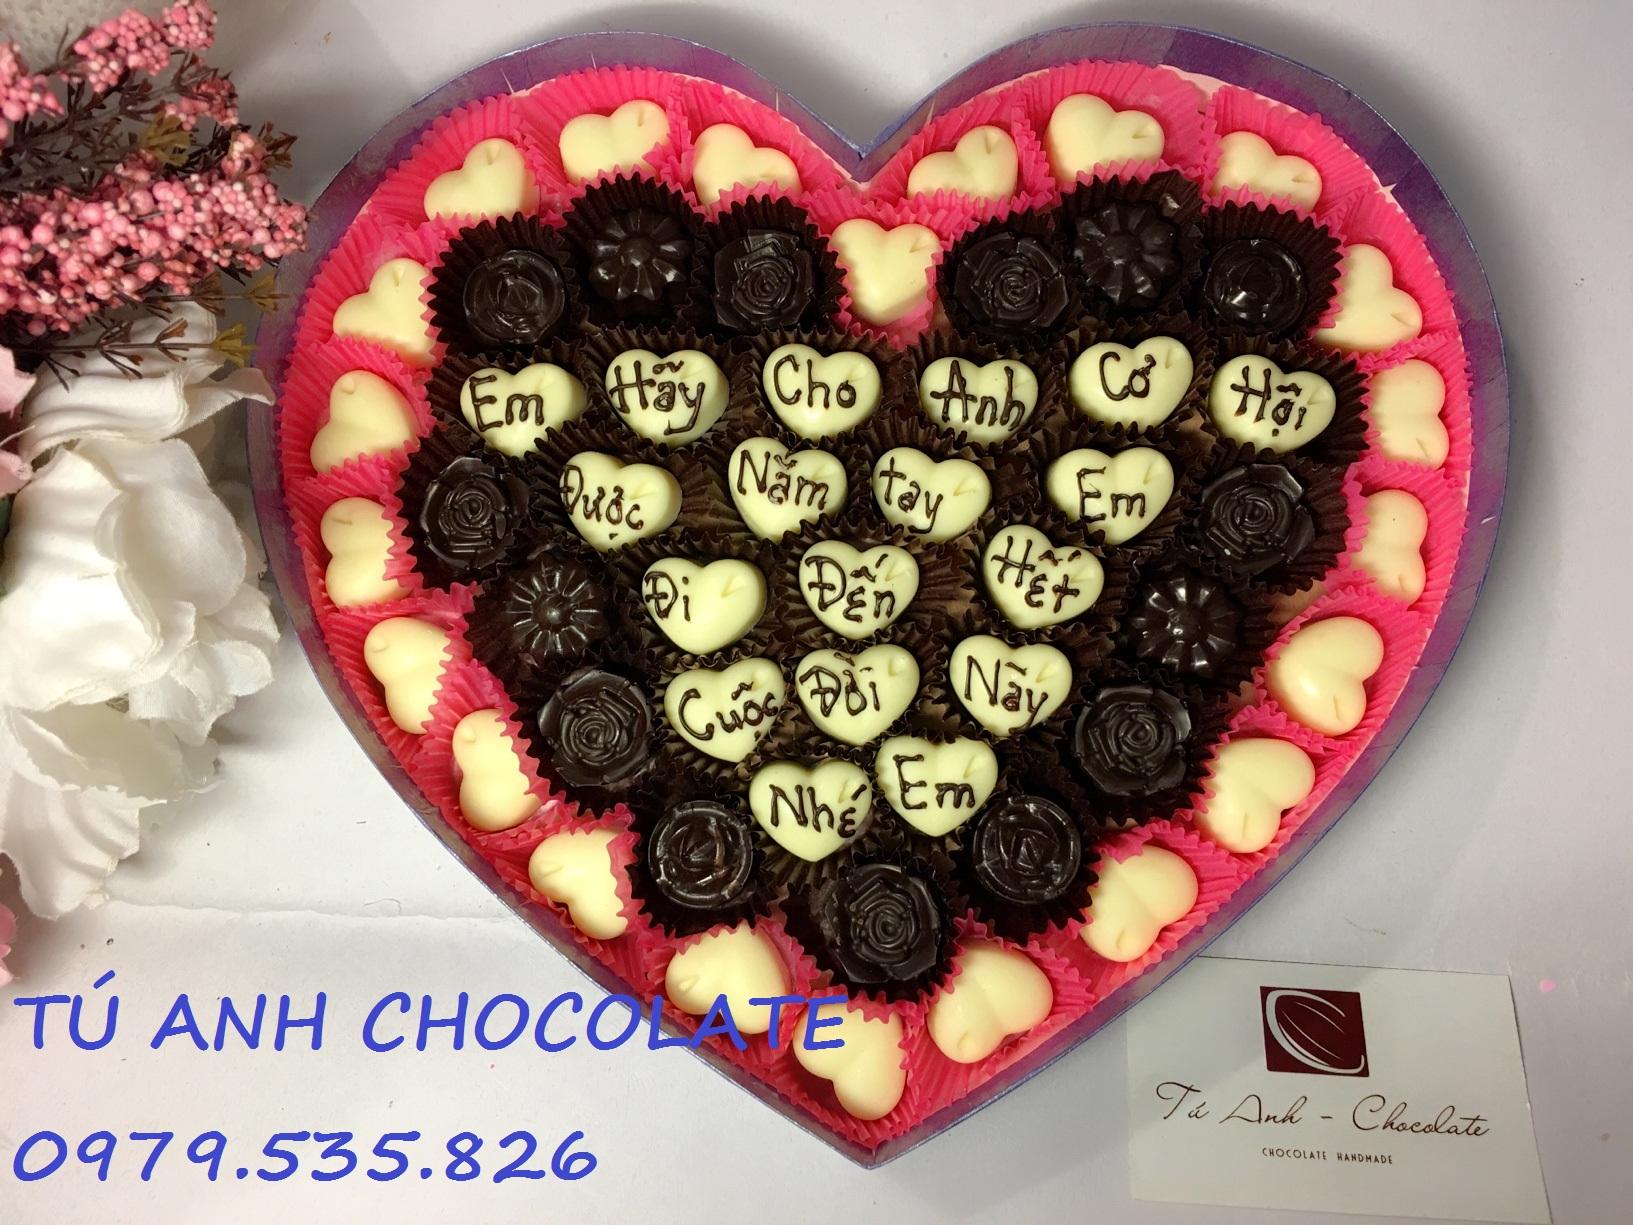 Socola valentine giá cực rẻ - TÚ ANH SHOP